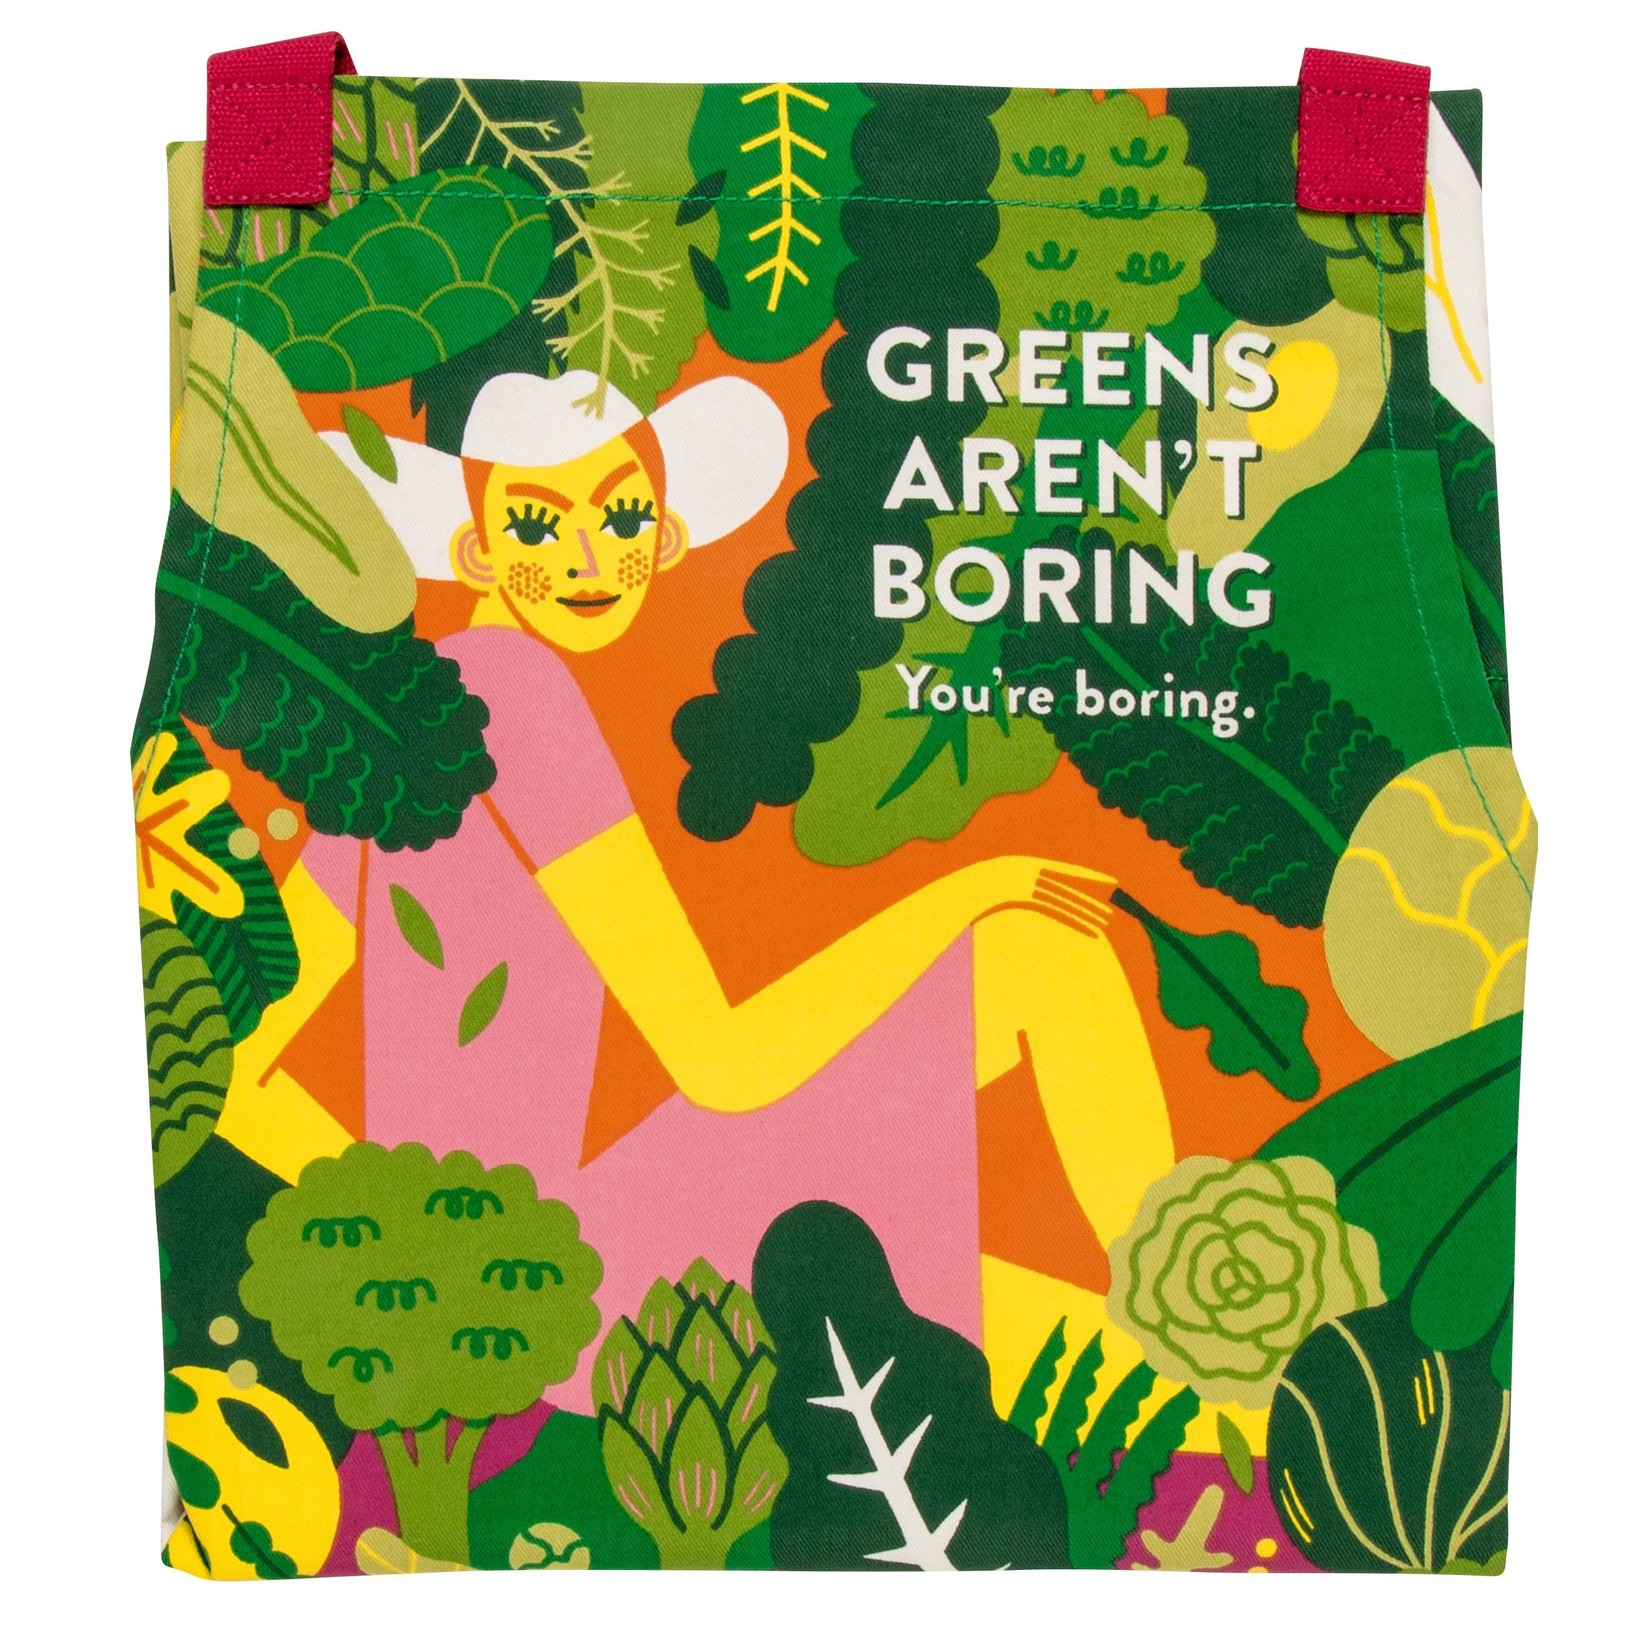 Blue Q Greens Aren't Boring, You're Boring Apron